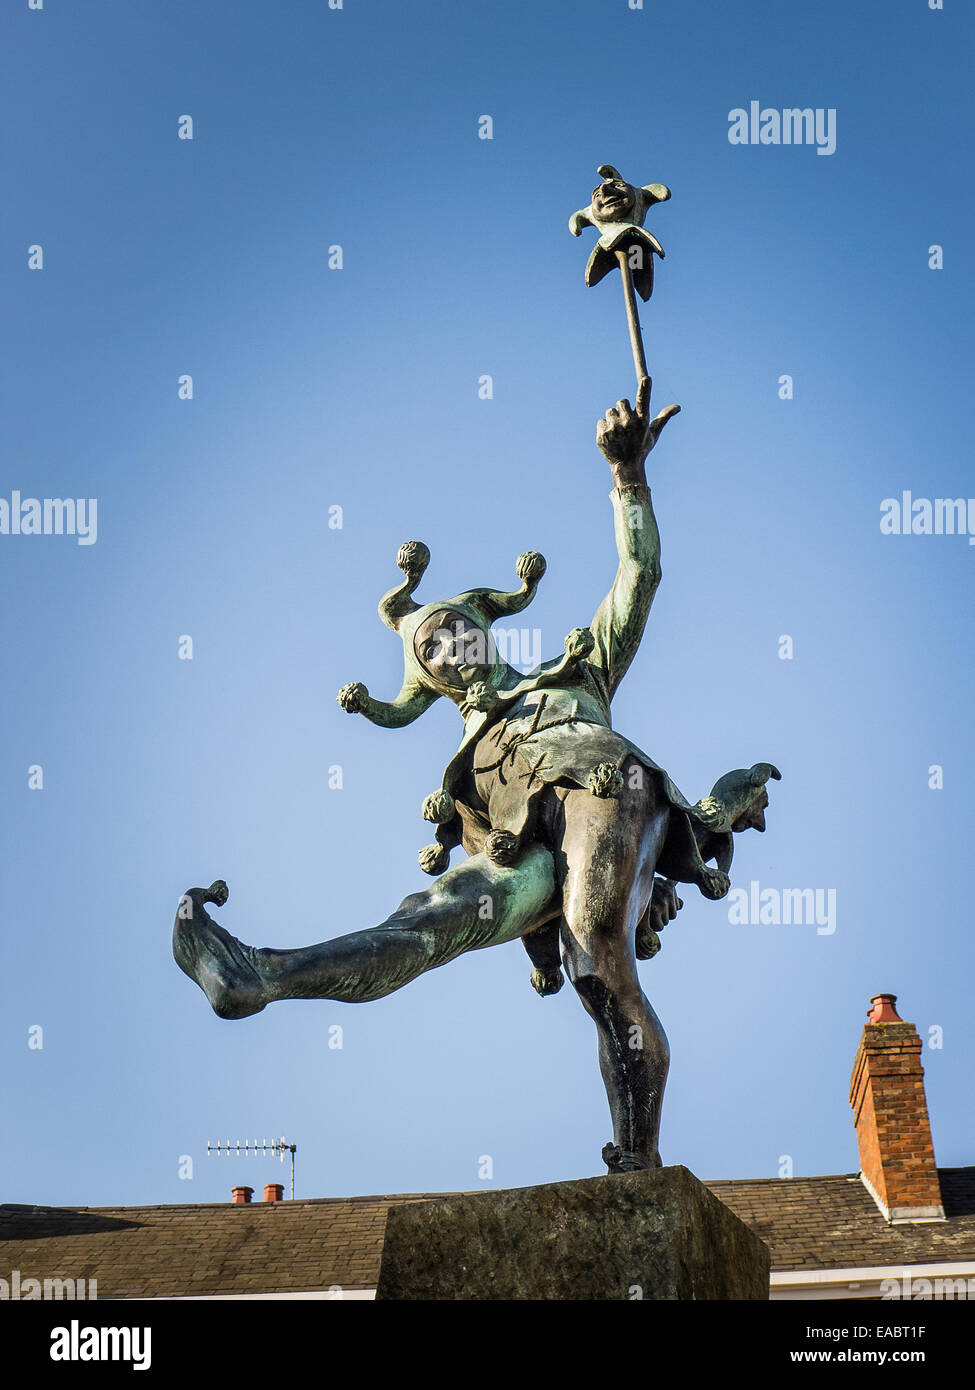 Shakespearean Jester statue in Strafford on Avon UK - Stock Image